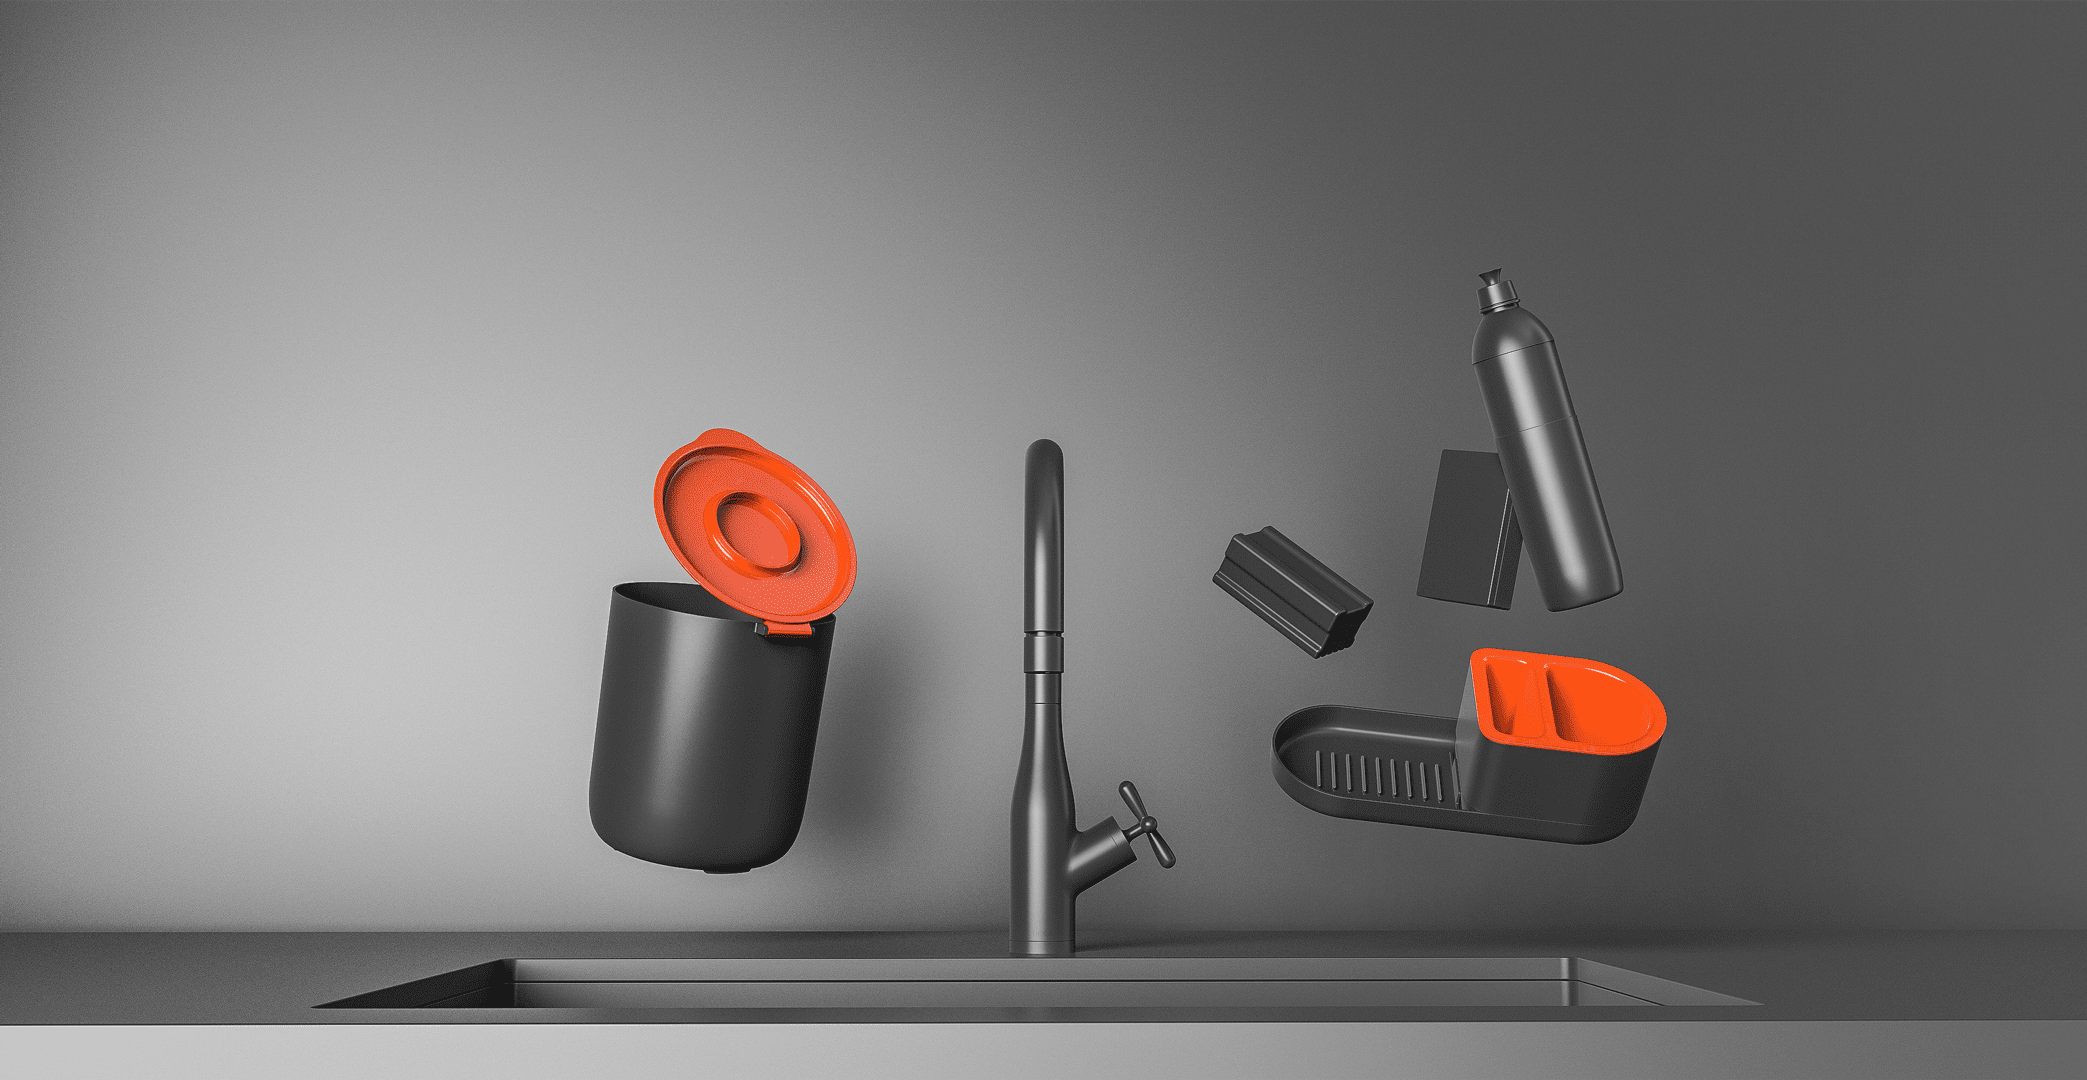 design-de-produto-arthi-valkiria-001